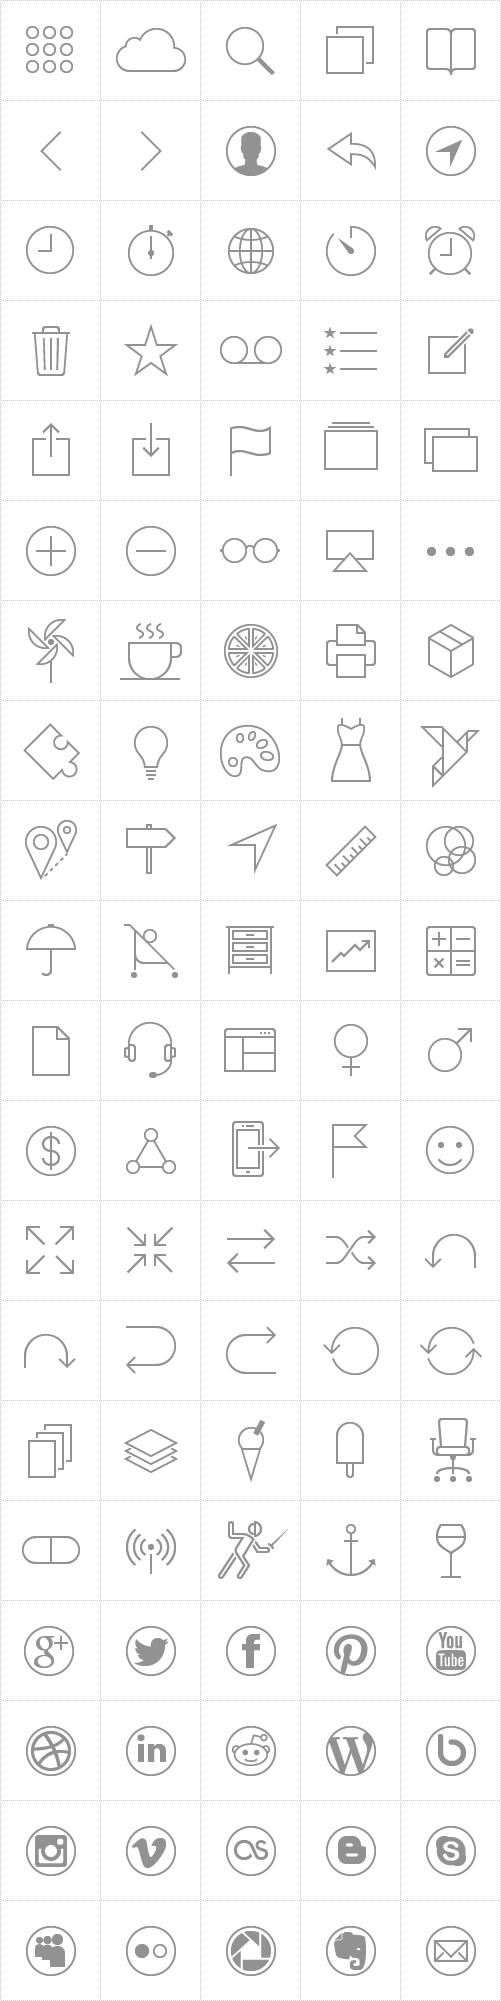 Free retina iOS 7 tab bar icons - Watch Create Short Meaningful Videos via Gloopt. https://itunes.apple.com/us/app/gloopt/id885729225